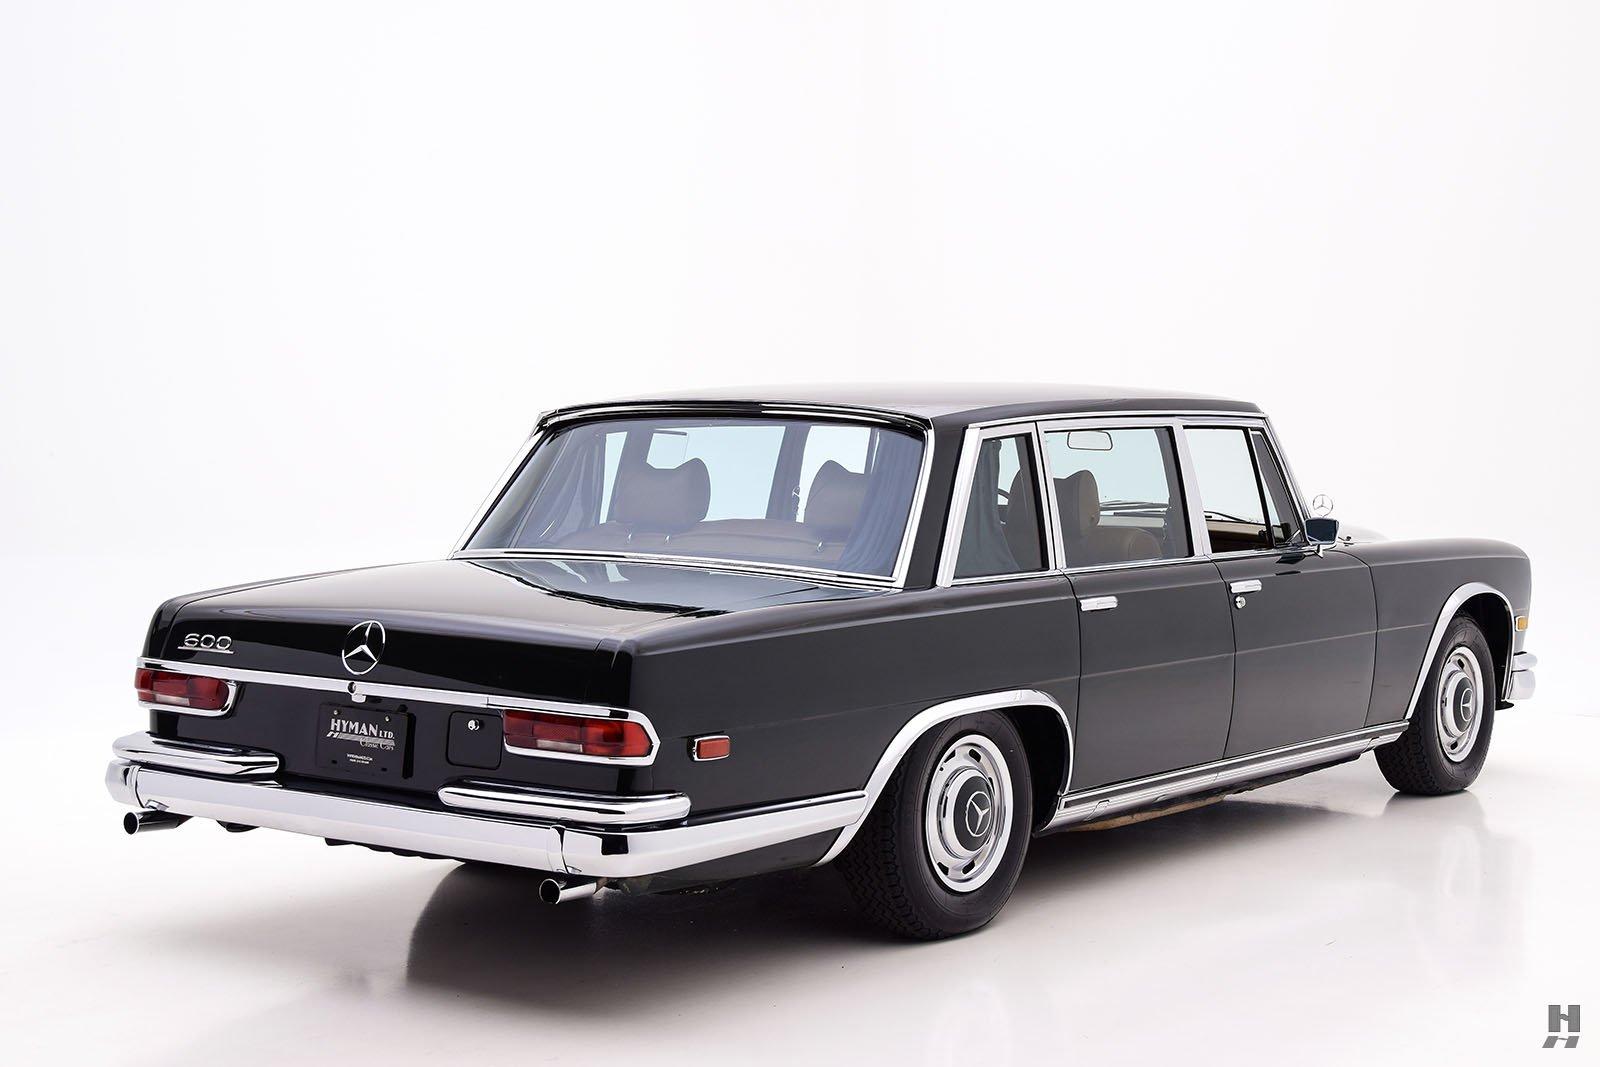 1969 mercedes benz 600 sedan hyman ltd classic cars for 1969 mercedes benz